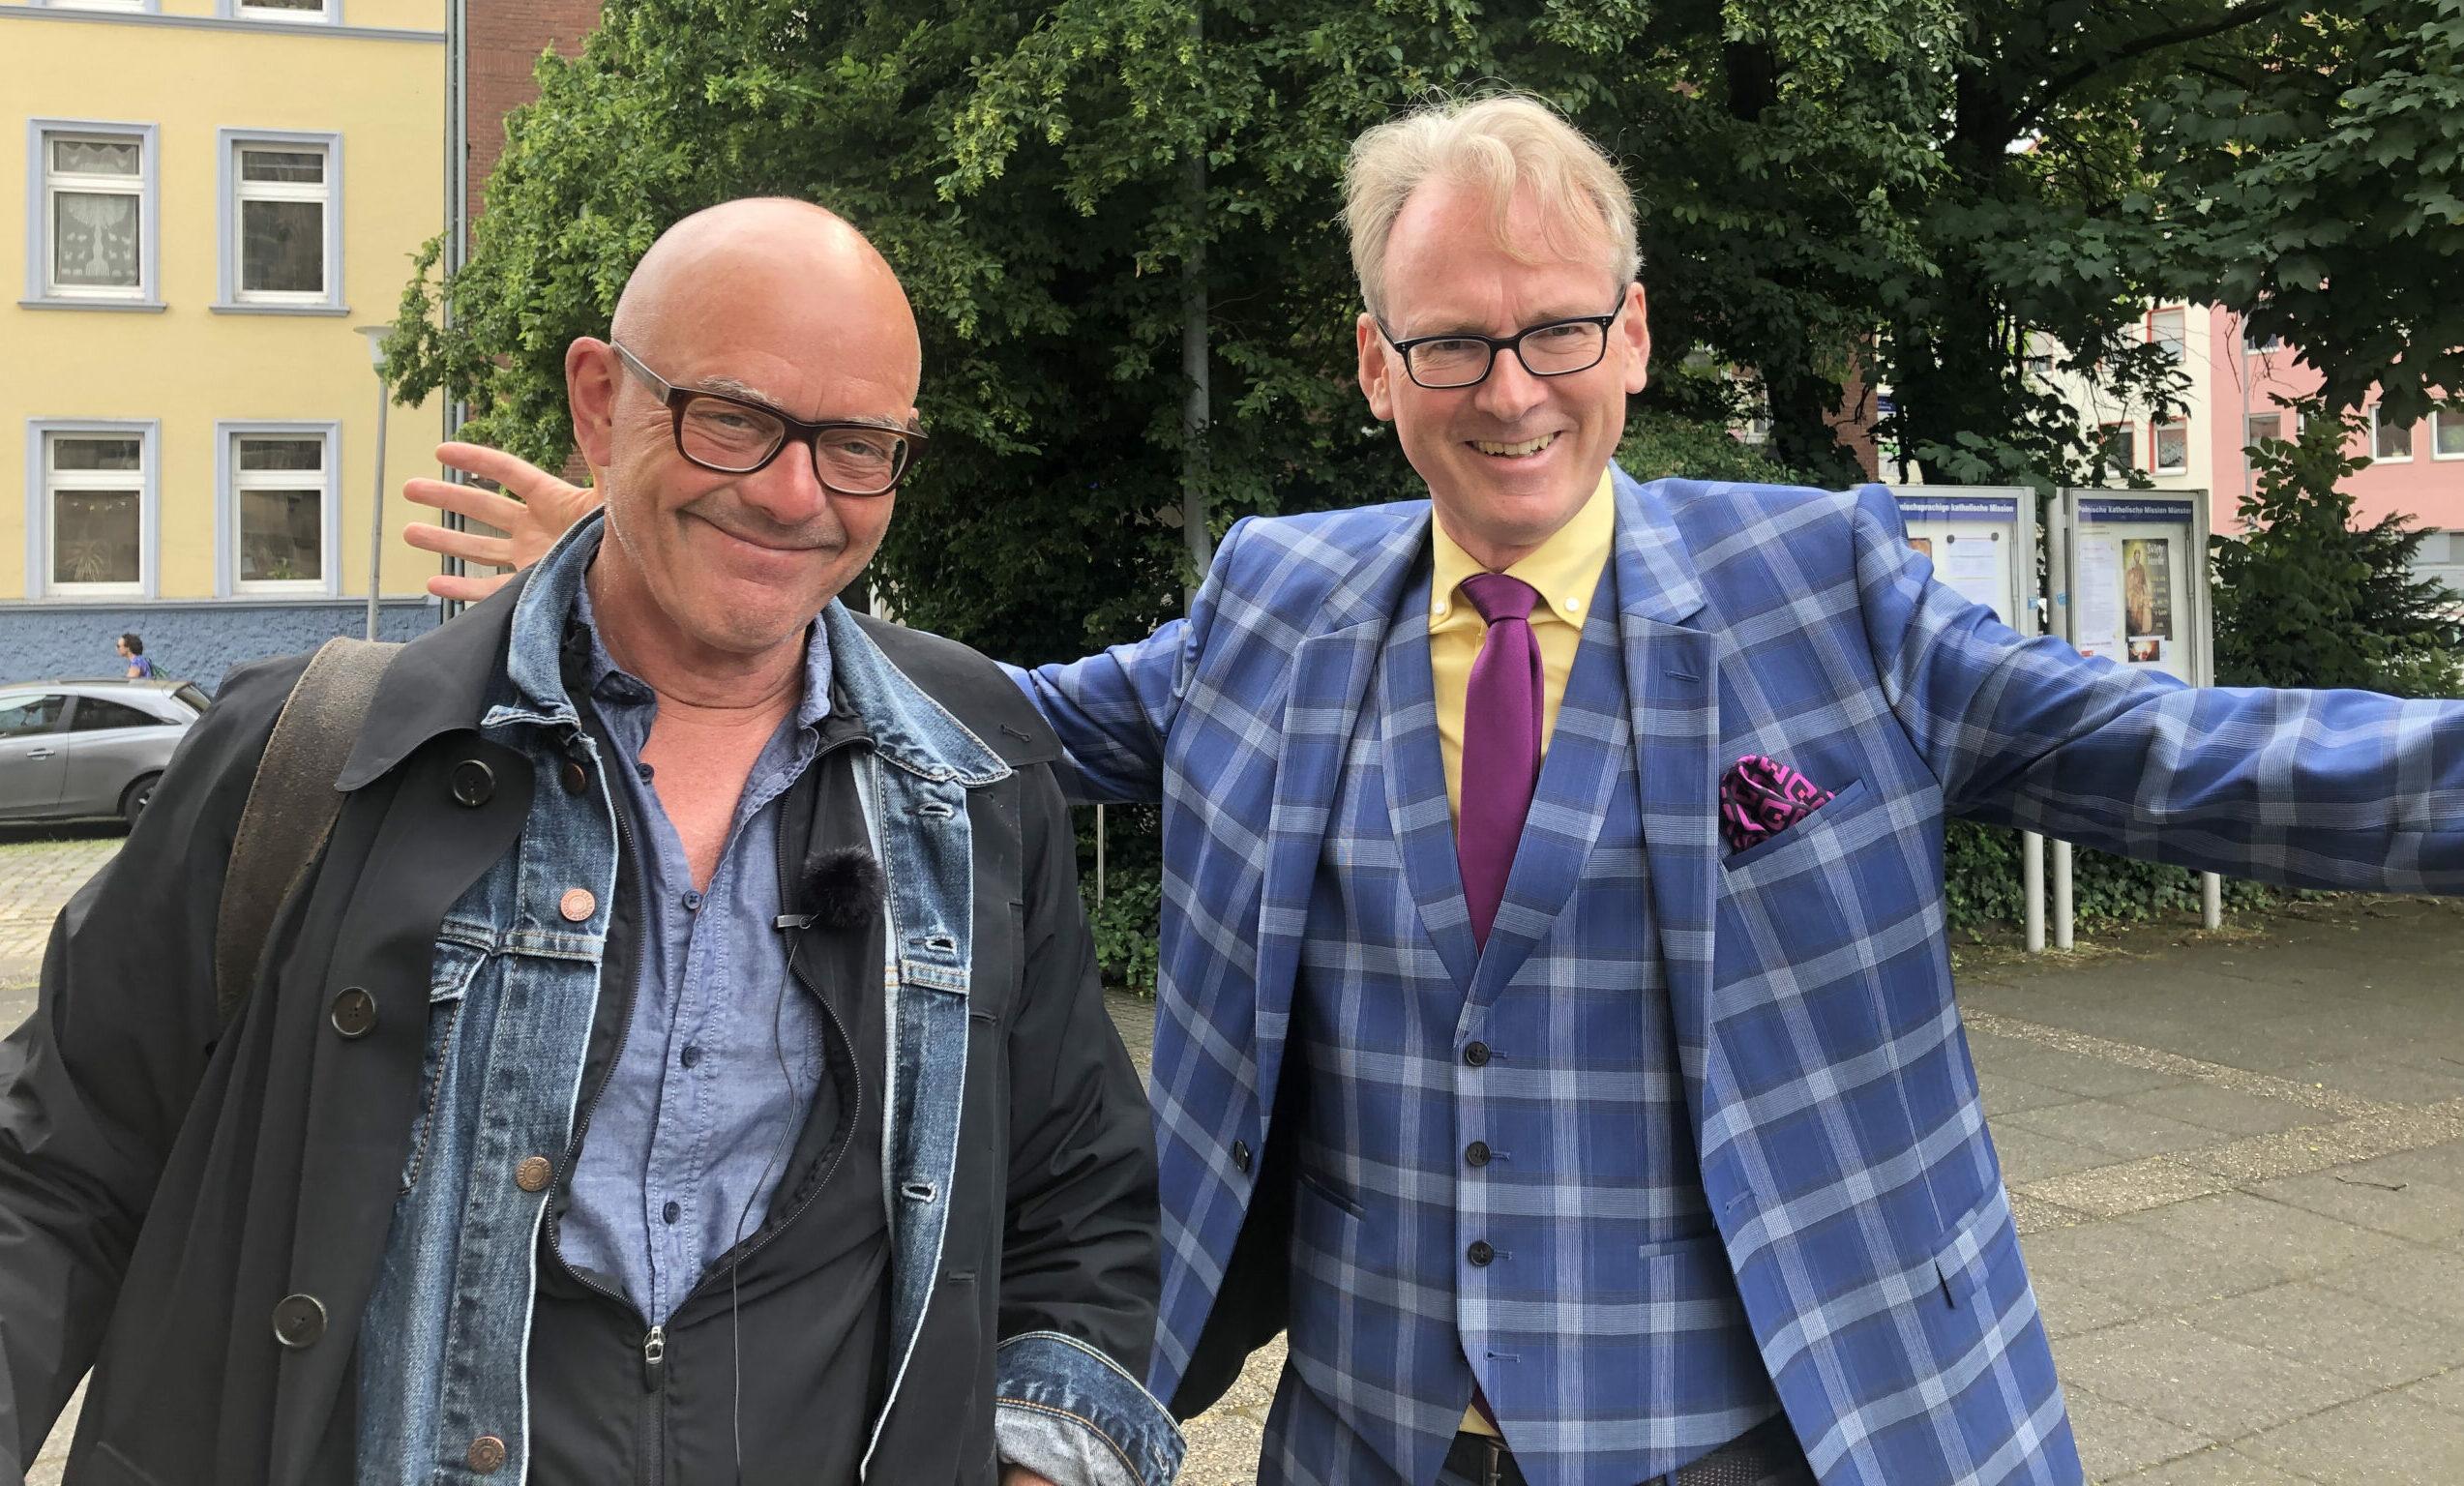 Kulturspaziergang Wilhelm Schlotterer & Adam Riese